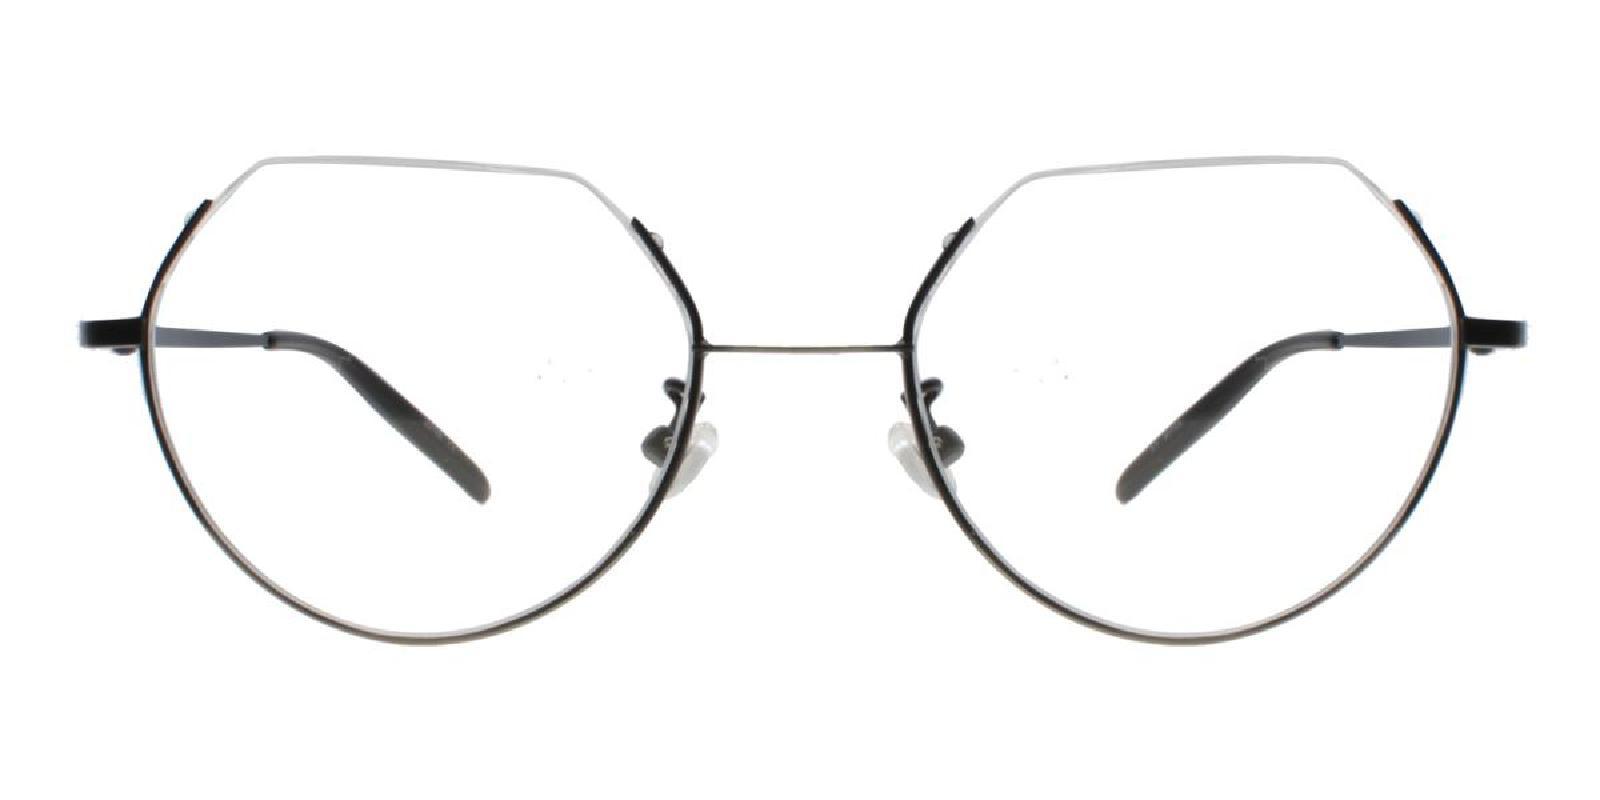 Hudson-Silver-Geometric-Metal-Eyeglasses-additional2